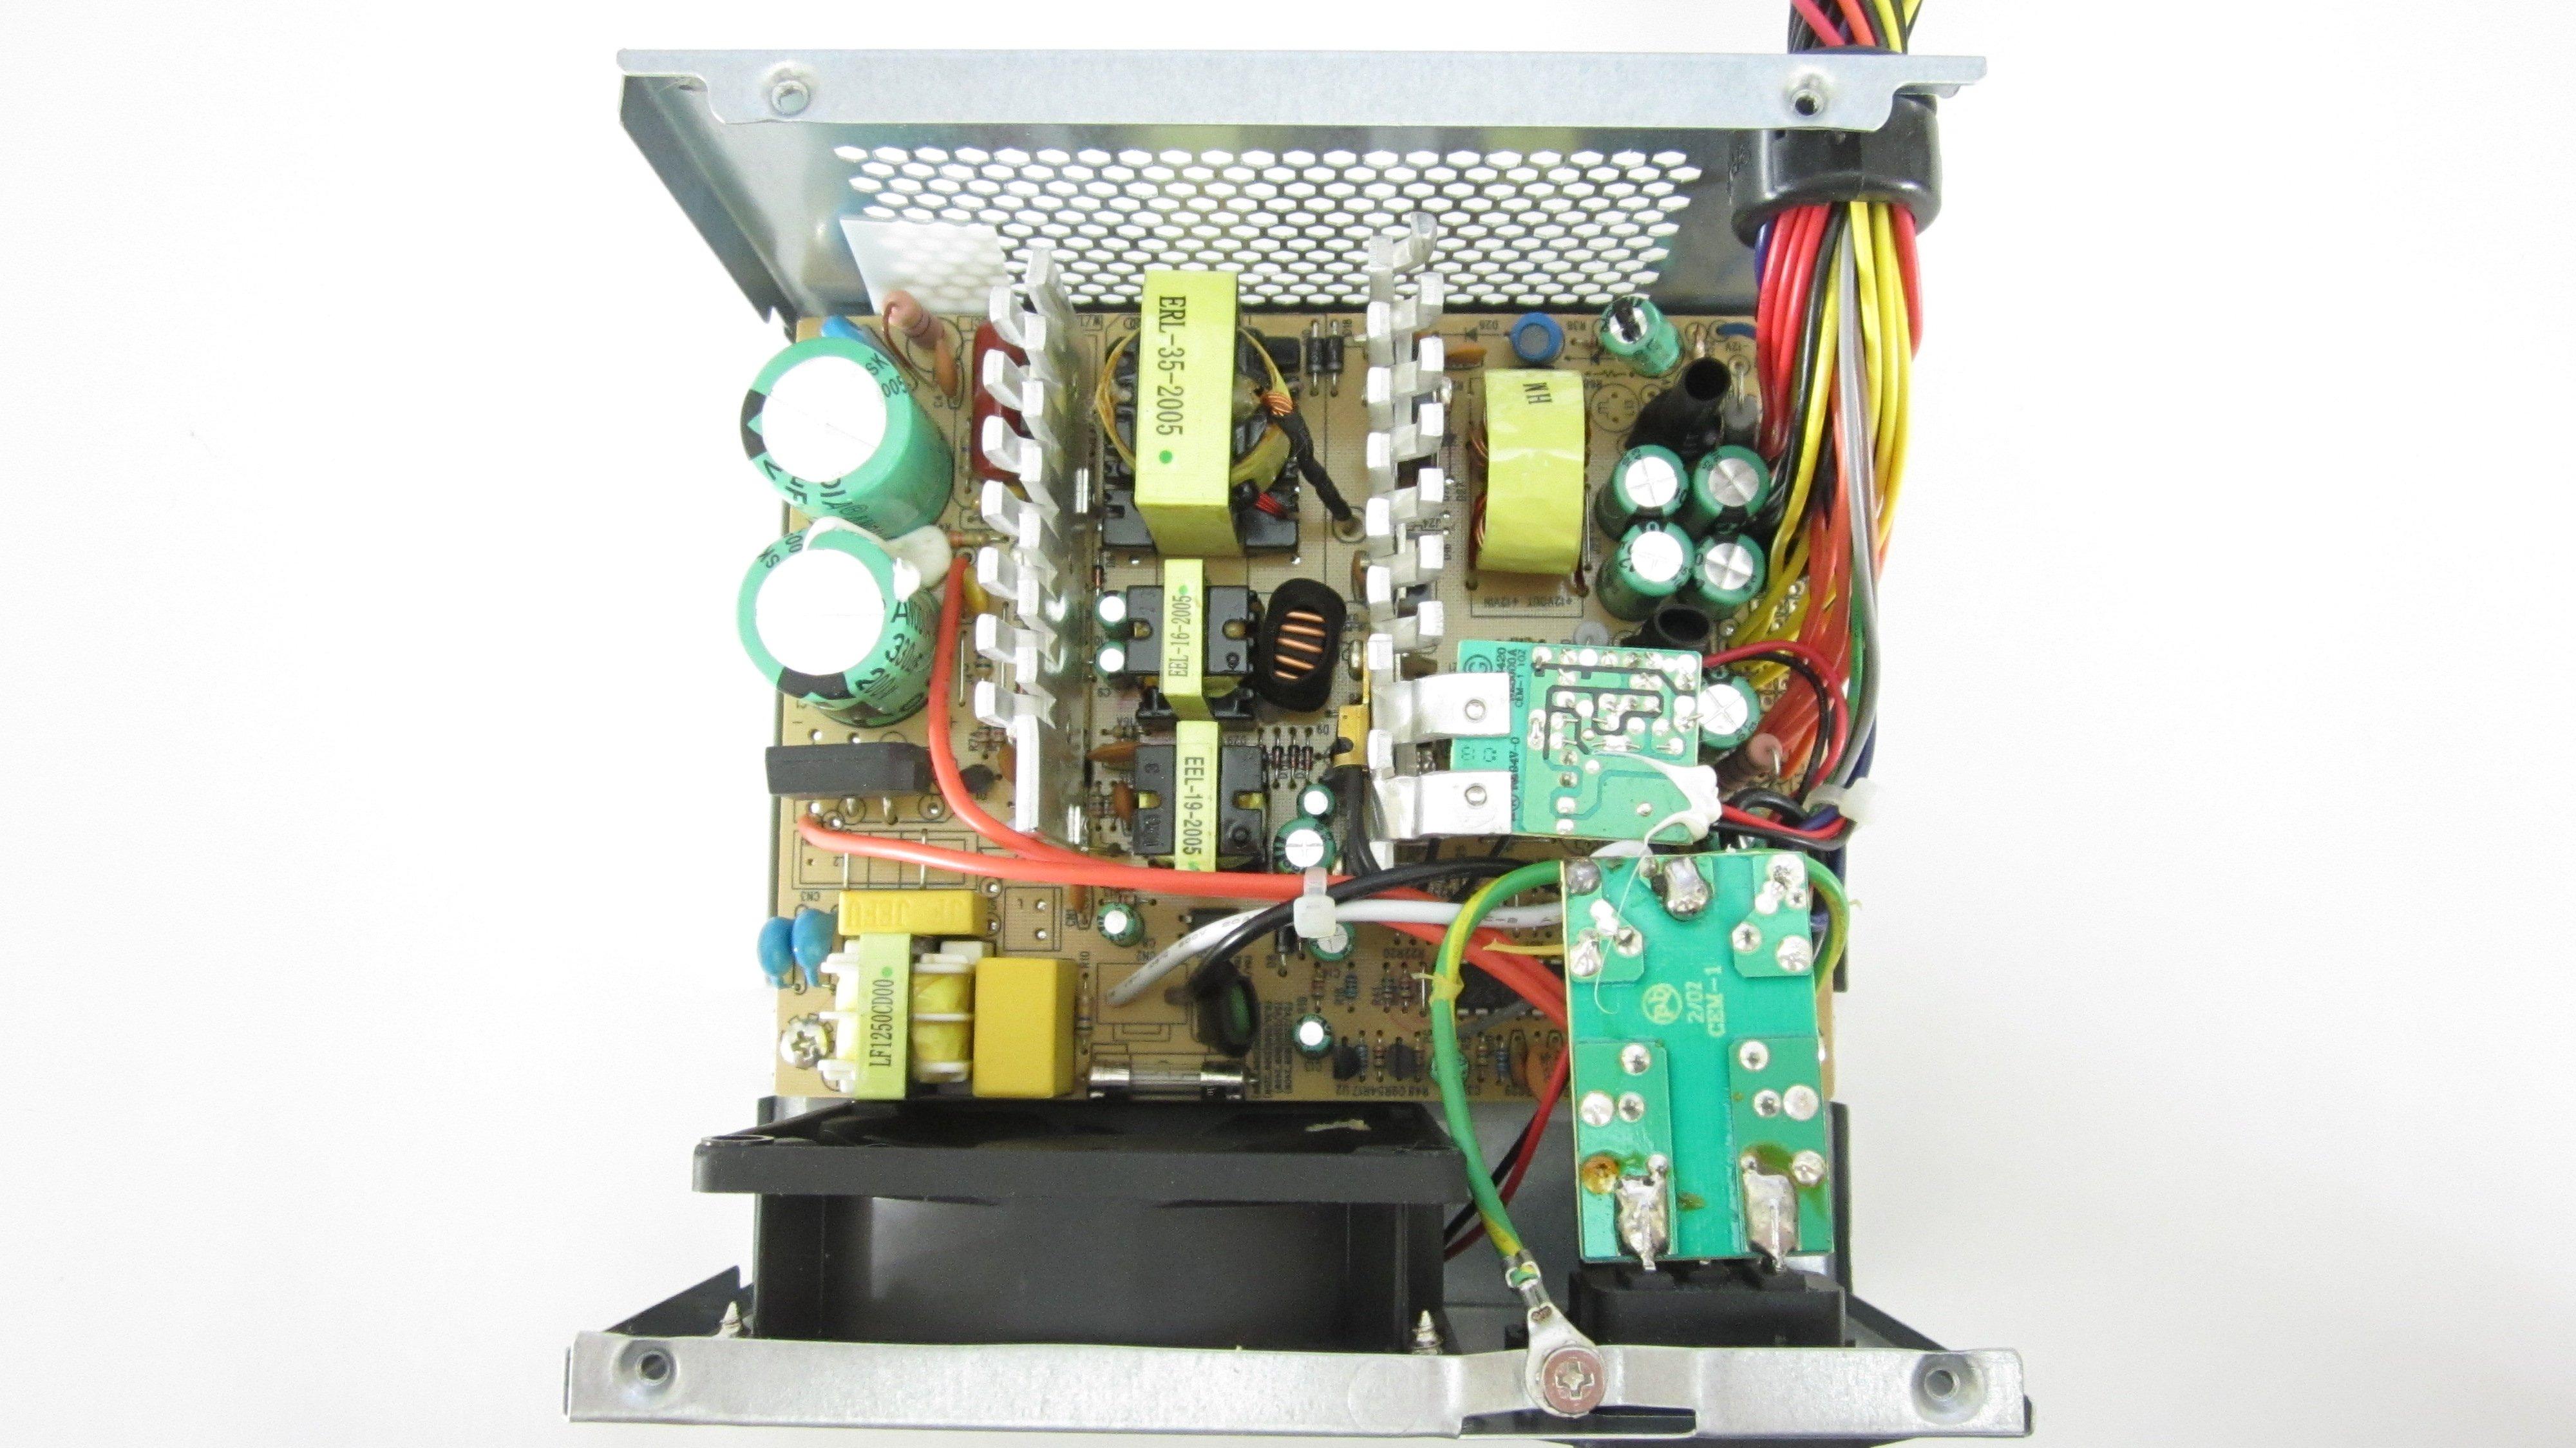 images?q=tbn:ANd9GcQh_l3eQ5xwiPy07kGEXjmjgmBKBRB7H2mRxCGhv1tFWg5c_mWT Power Supply Pc Wiring Diagram